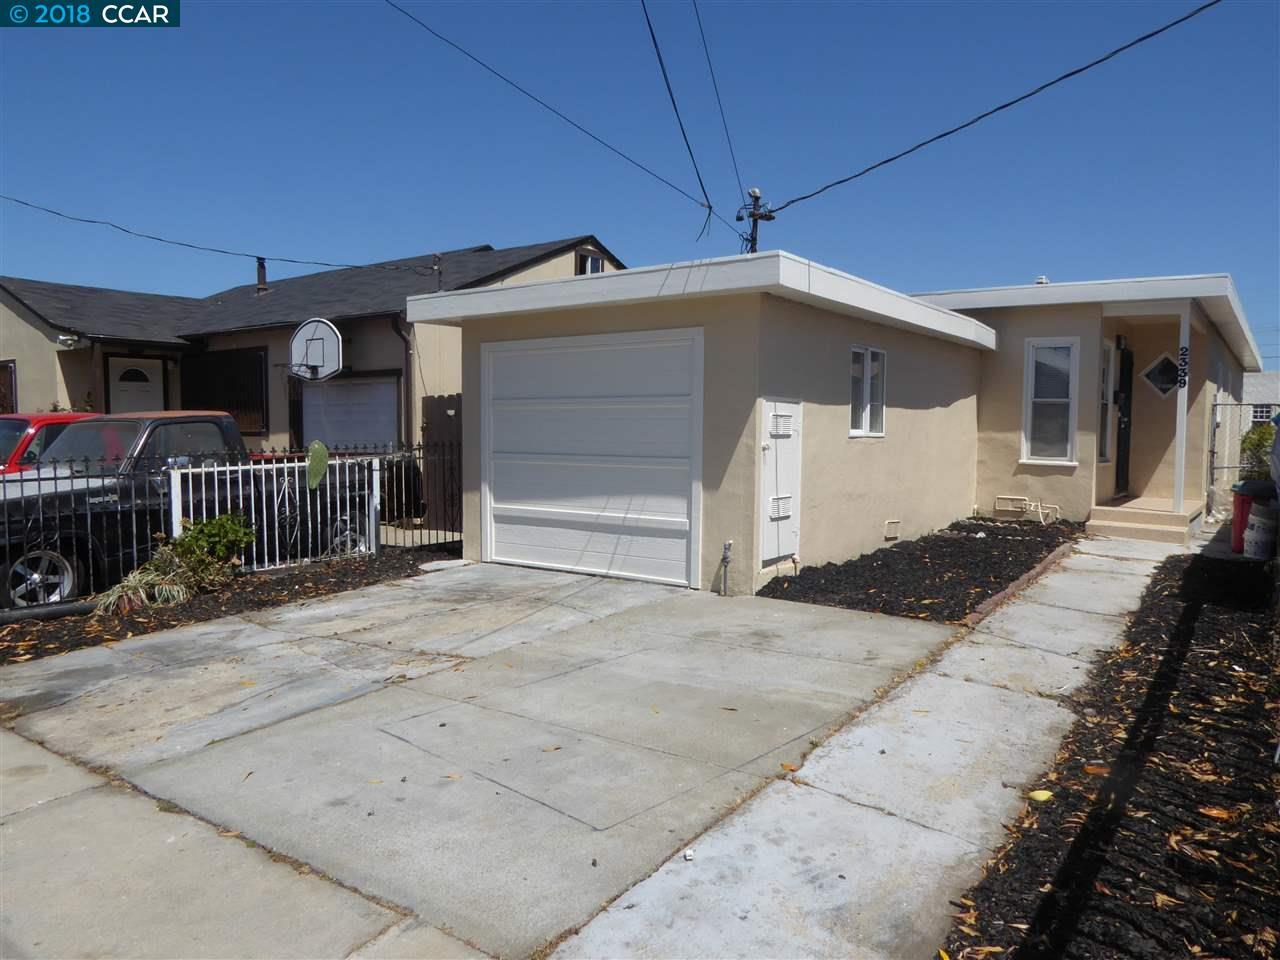 2339 MCBRYDE AVE, RICHMOND, CA 94804